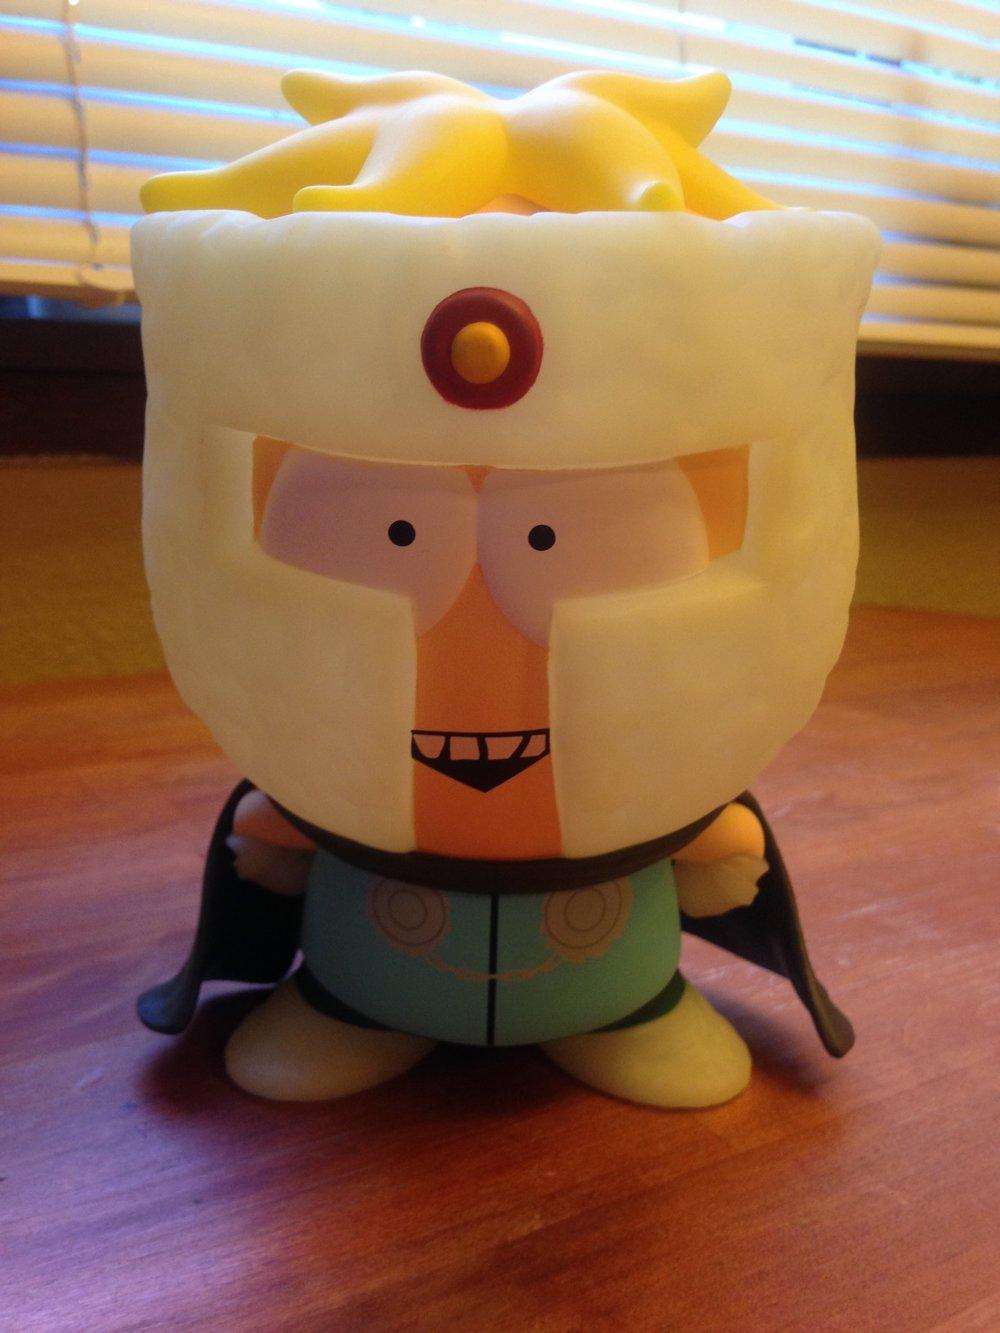 #8. Kidrobot Professor Chaos Figure